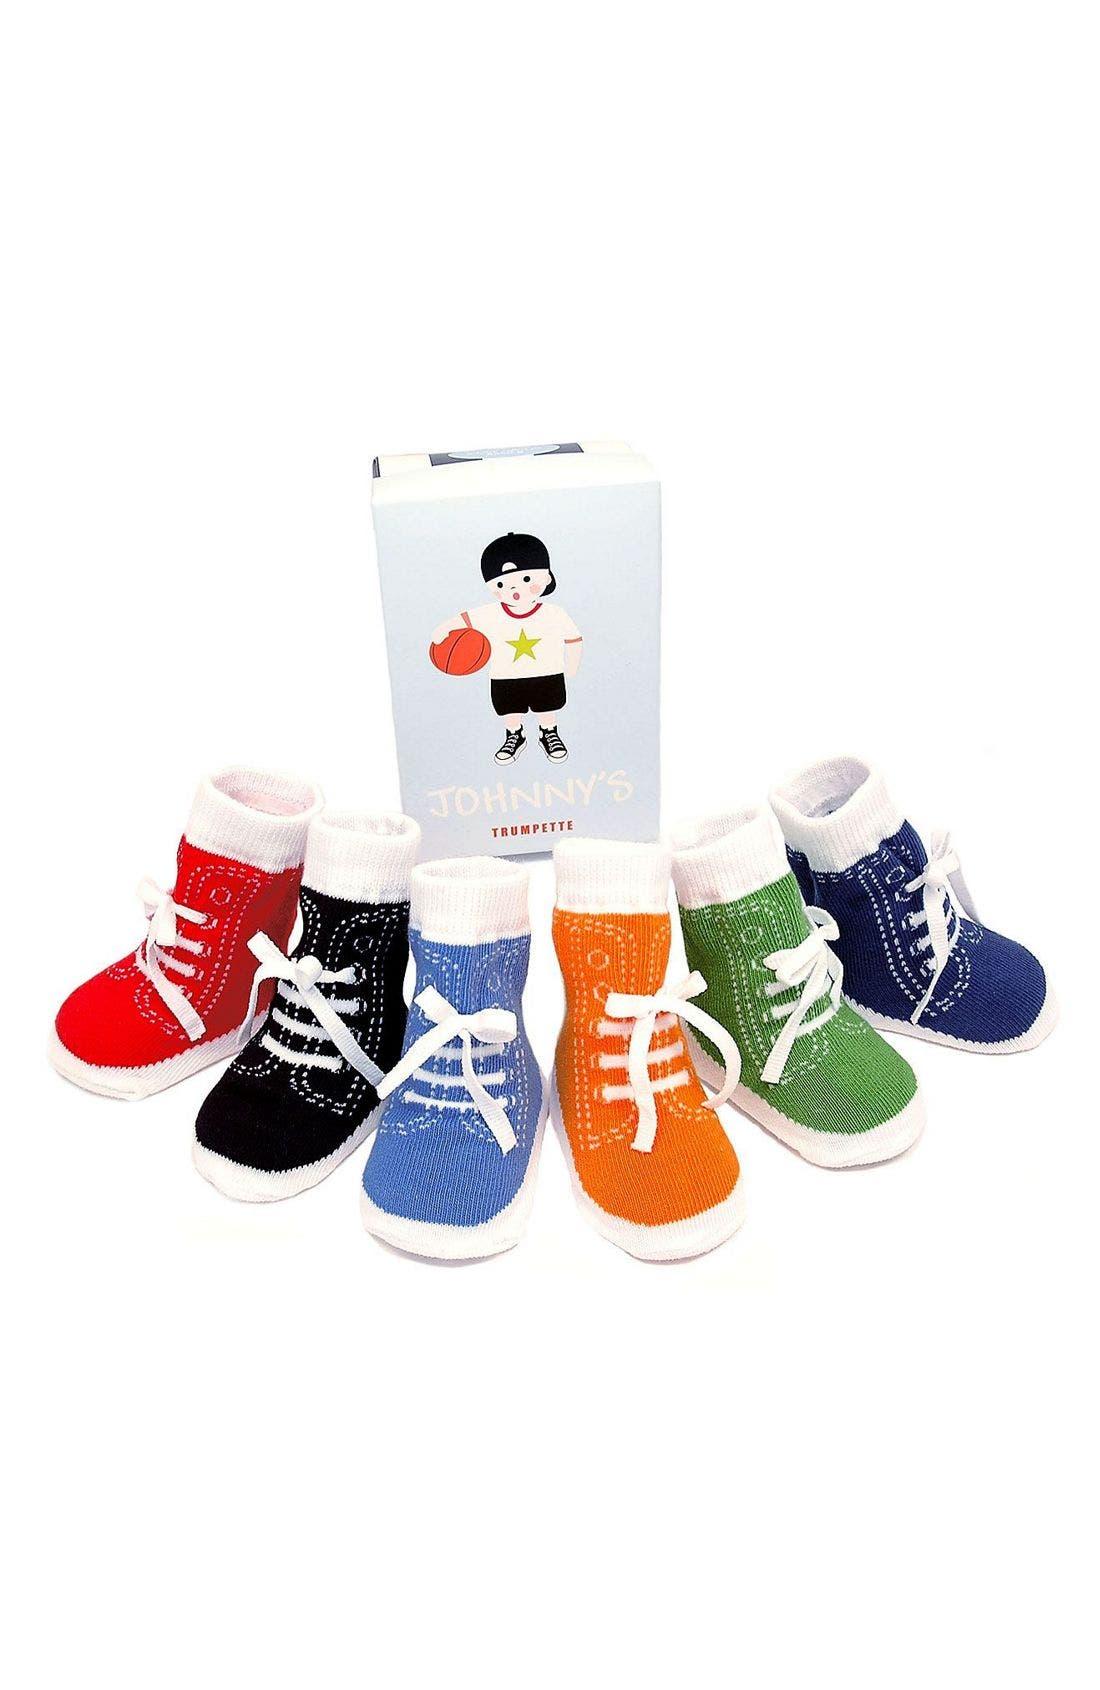 Alternate Image 1 Selected - Trumpette 'Johnny' Socks Gift Set (Baby Boys)